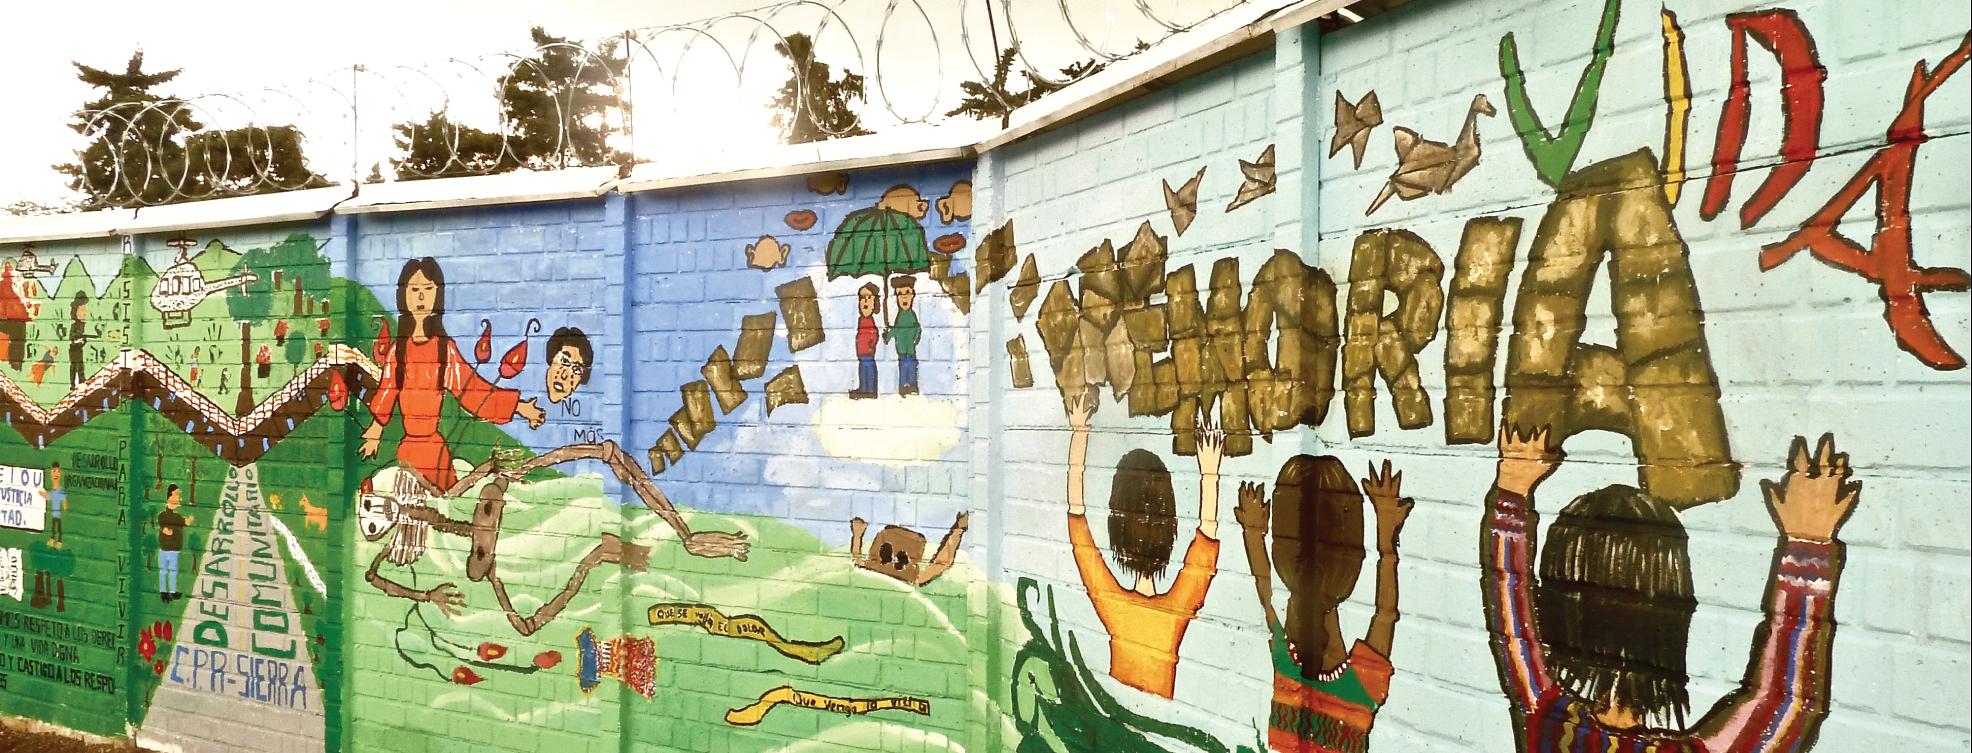 Guatemala-Wall-Mural-Slider